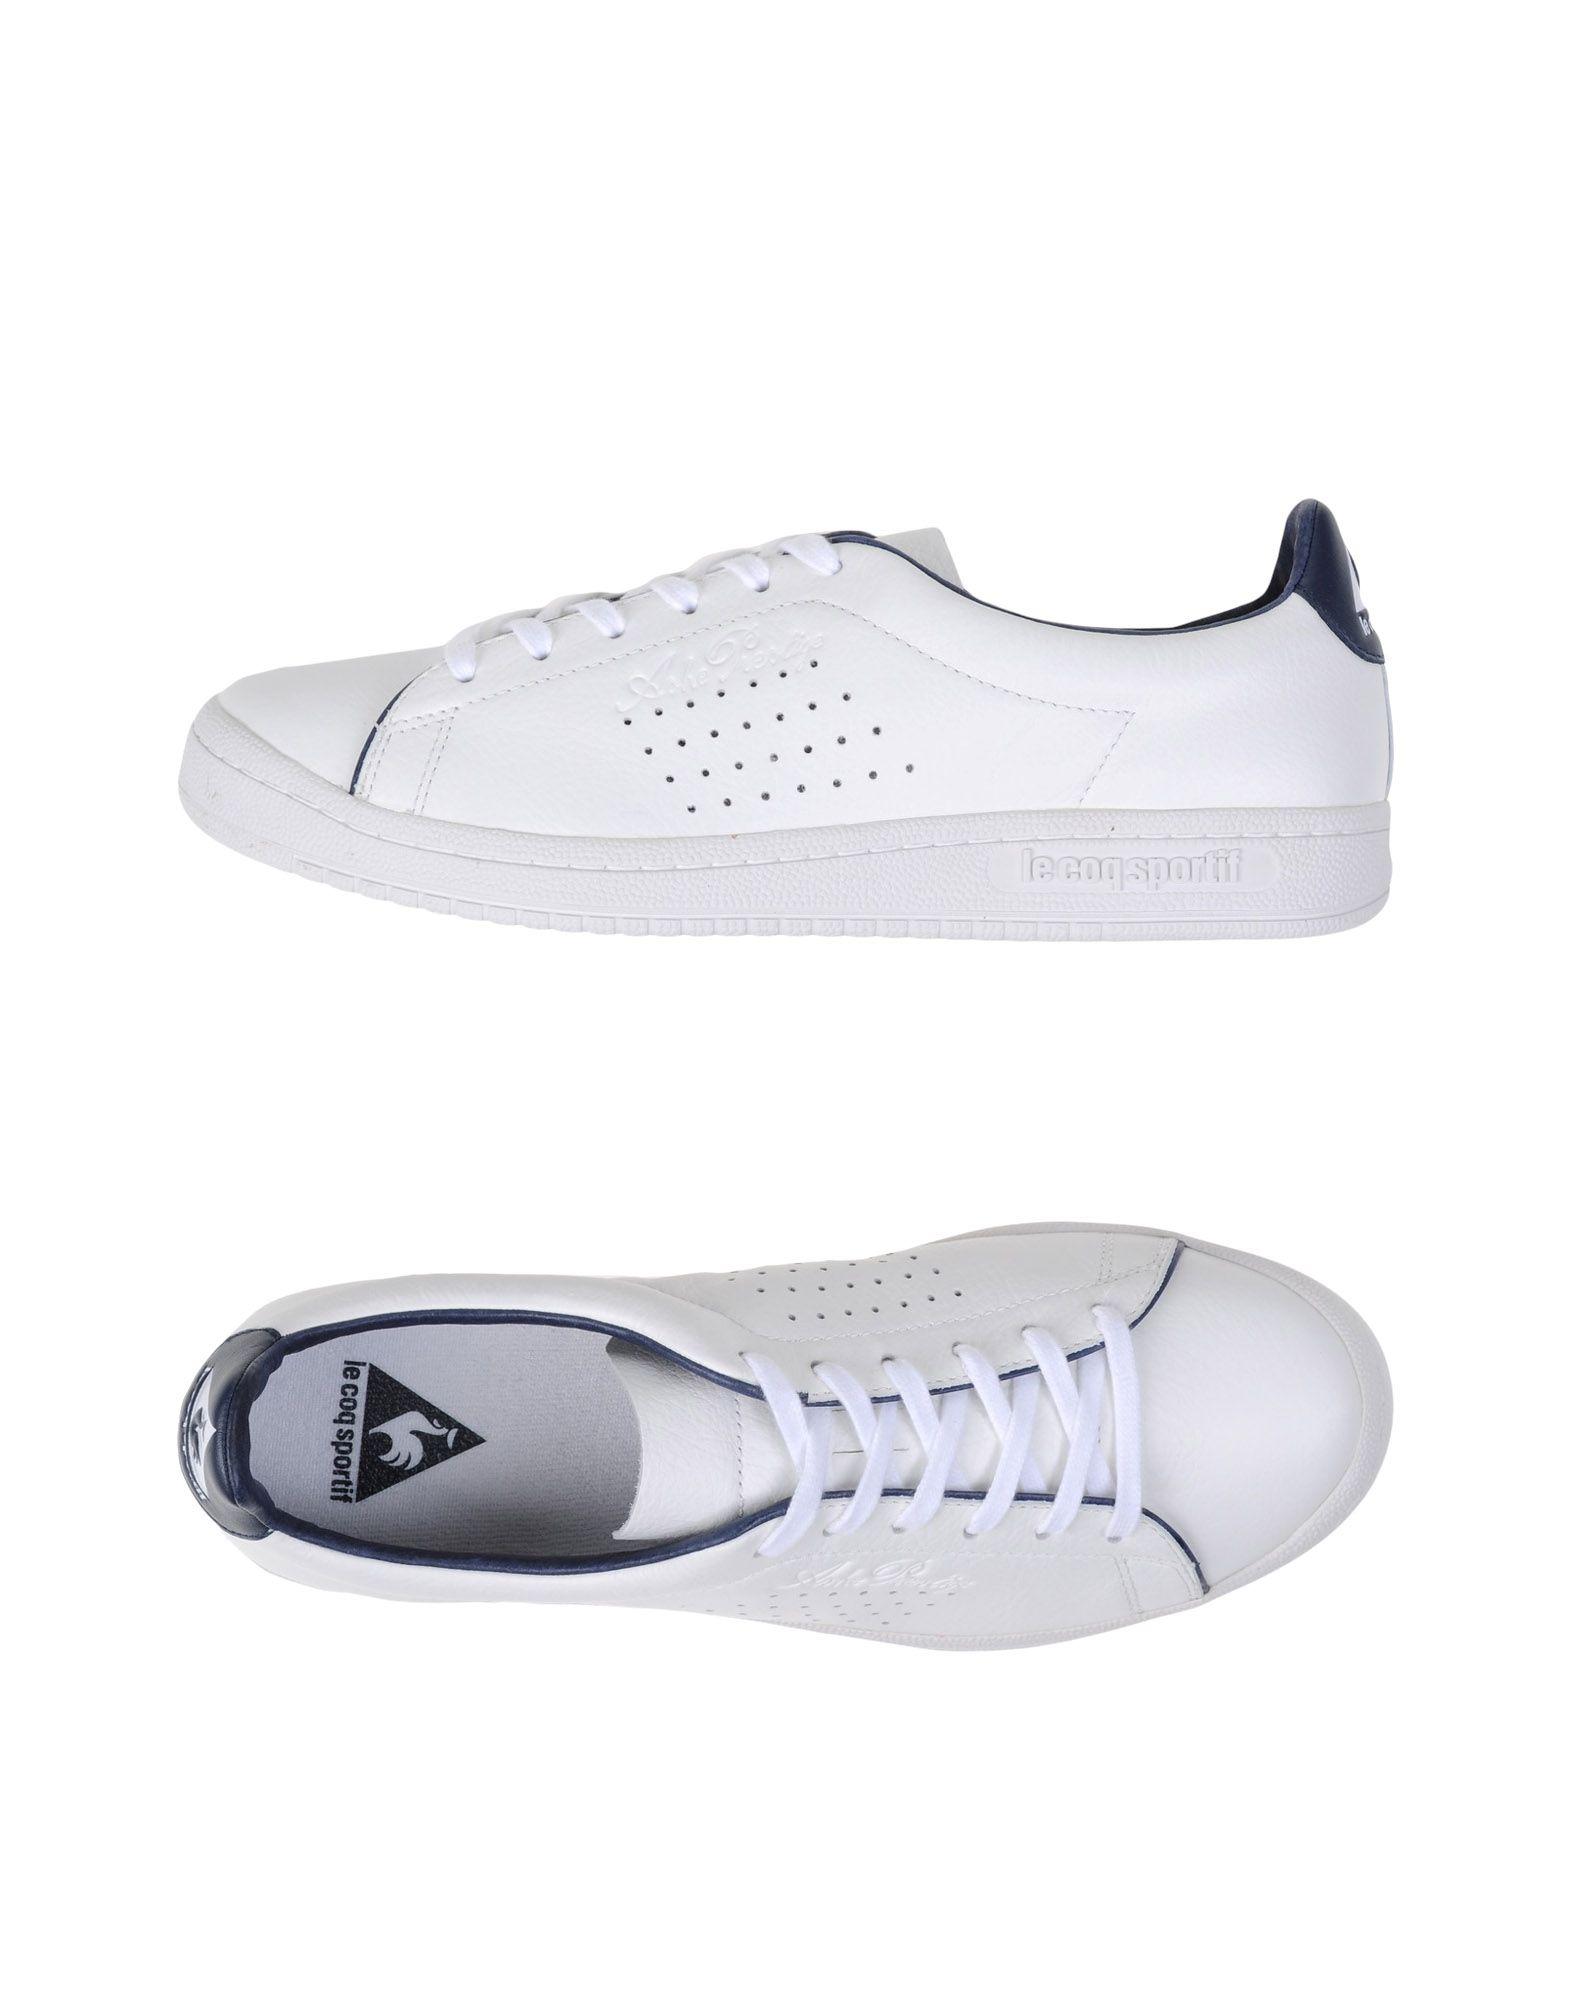 Sneakers Le Coq Sportif Ashe Prestige Lea - Homme - Sneakers Le Coq Sportif sur